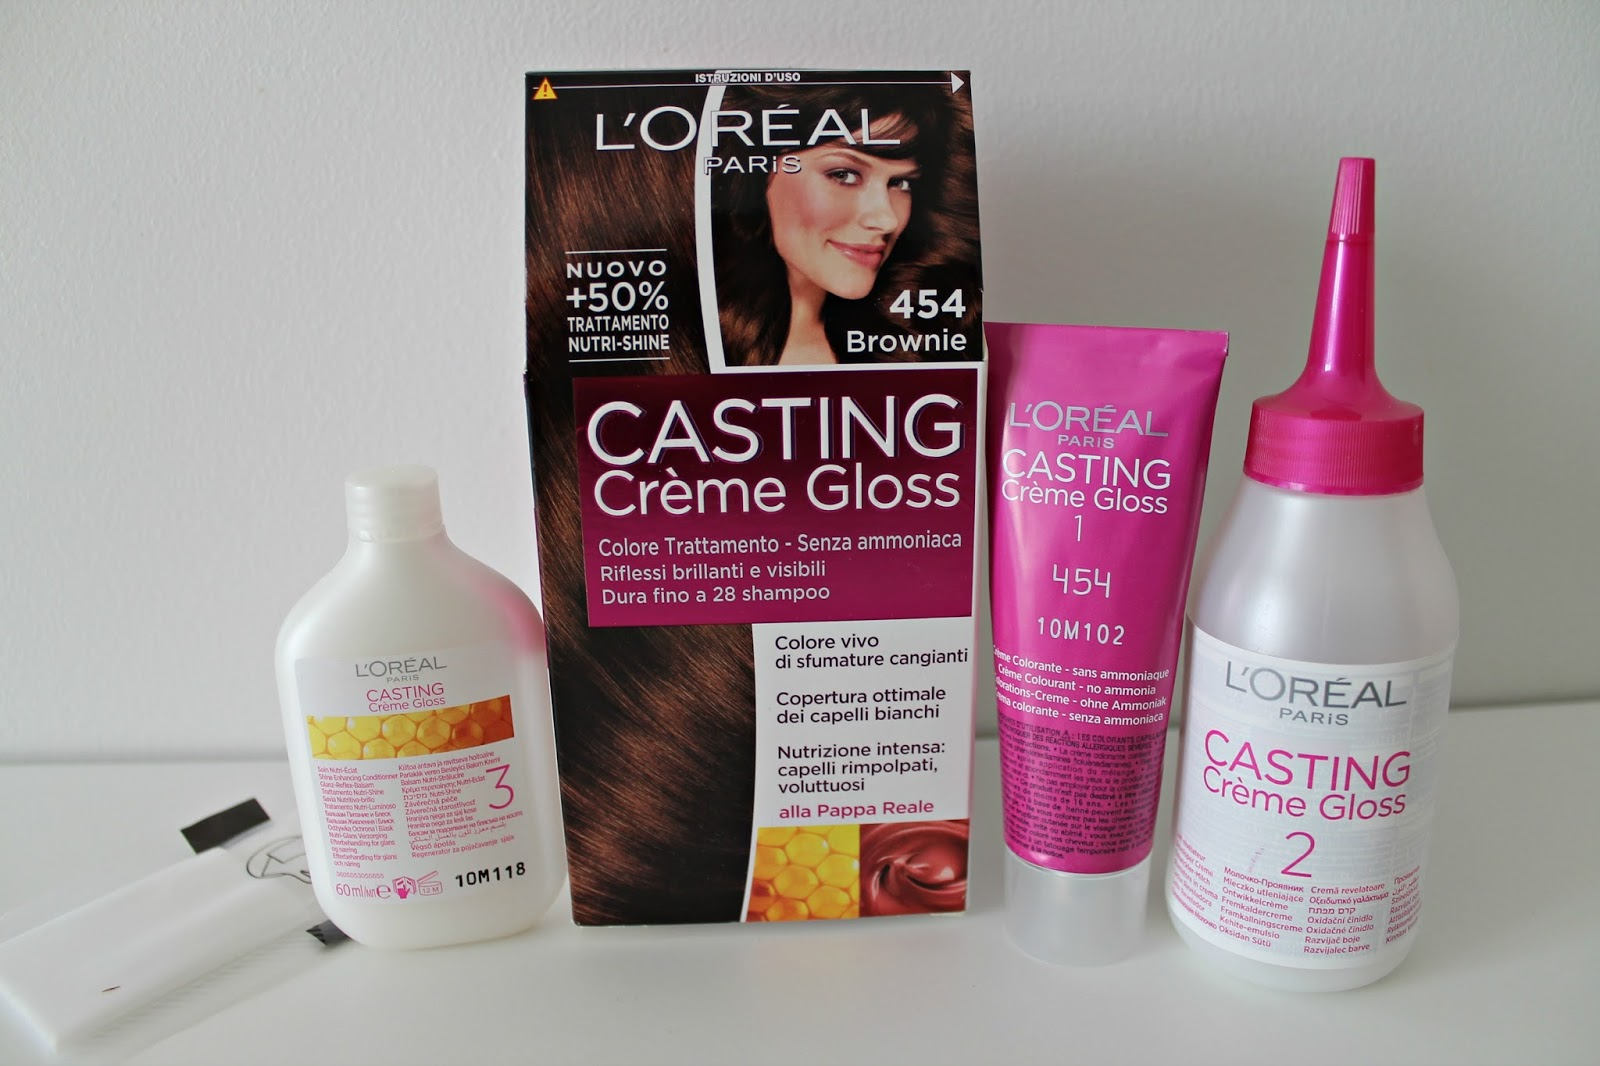 Casting Crème Gloss L'Oreal